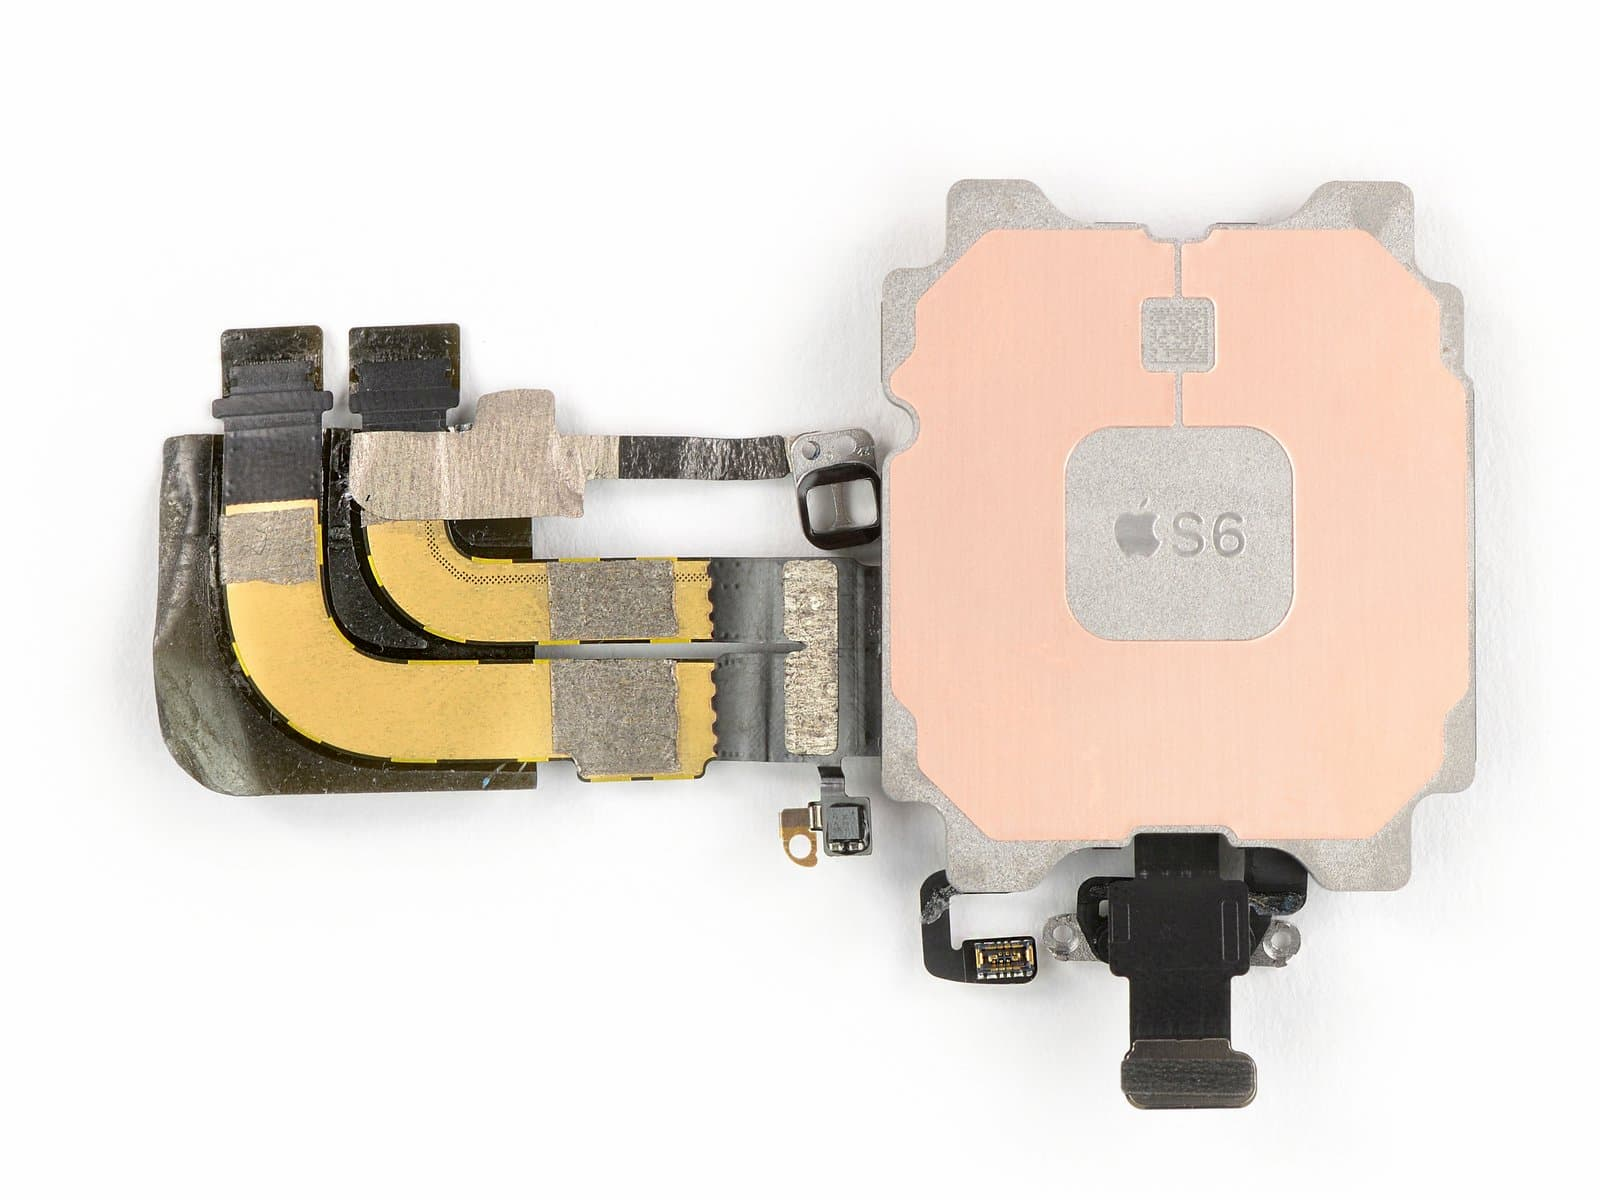 Apple Watch Series 6 拆解報告出爐:電池更大、內部明顯改進6